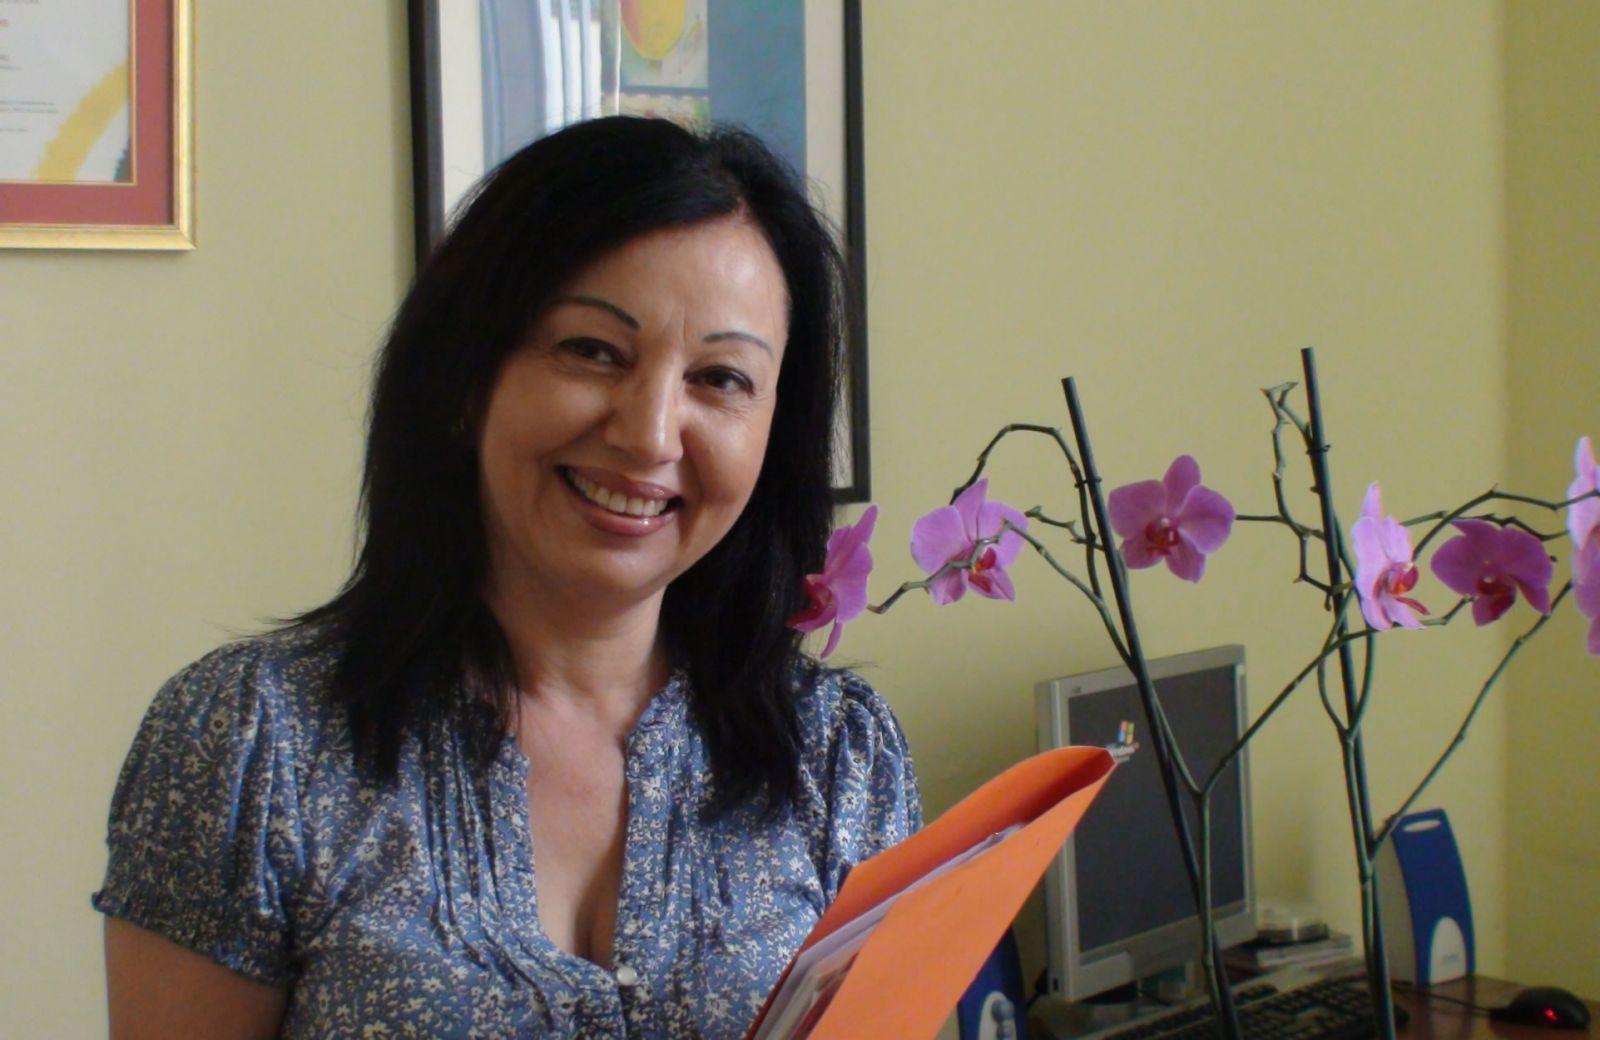 La directora del IES Pérez Galdós, en 'El andén'